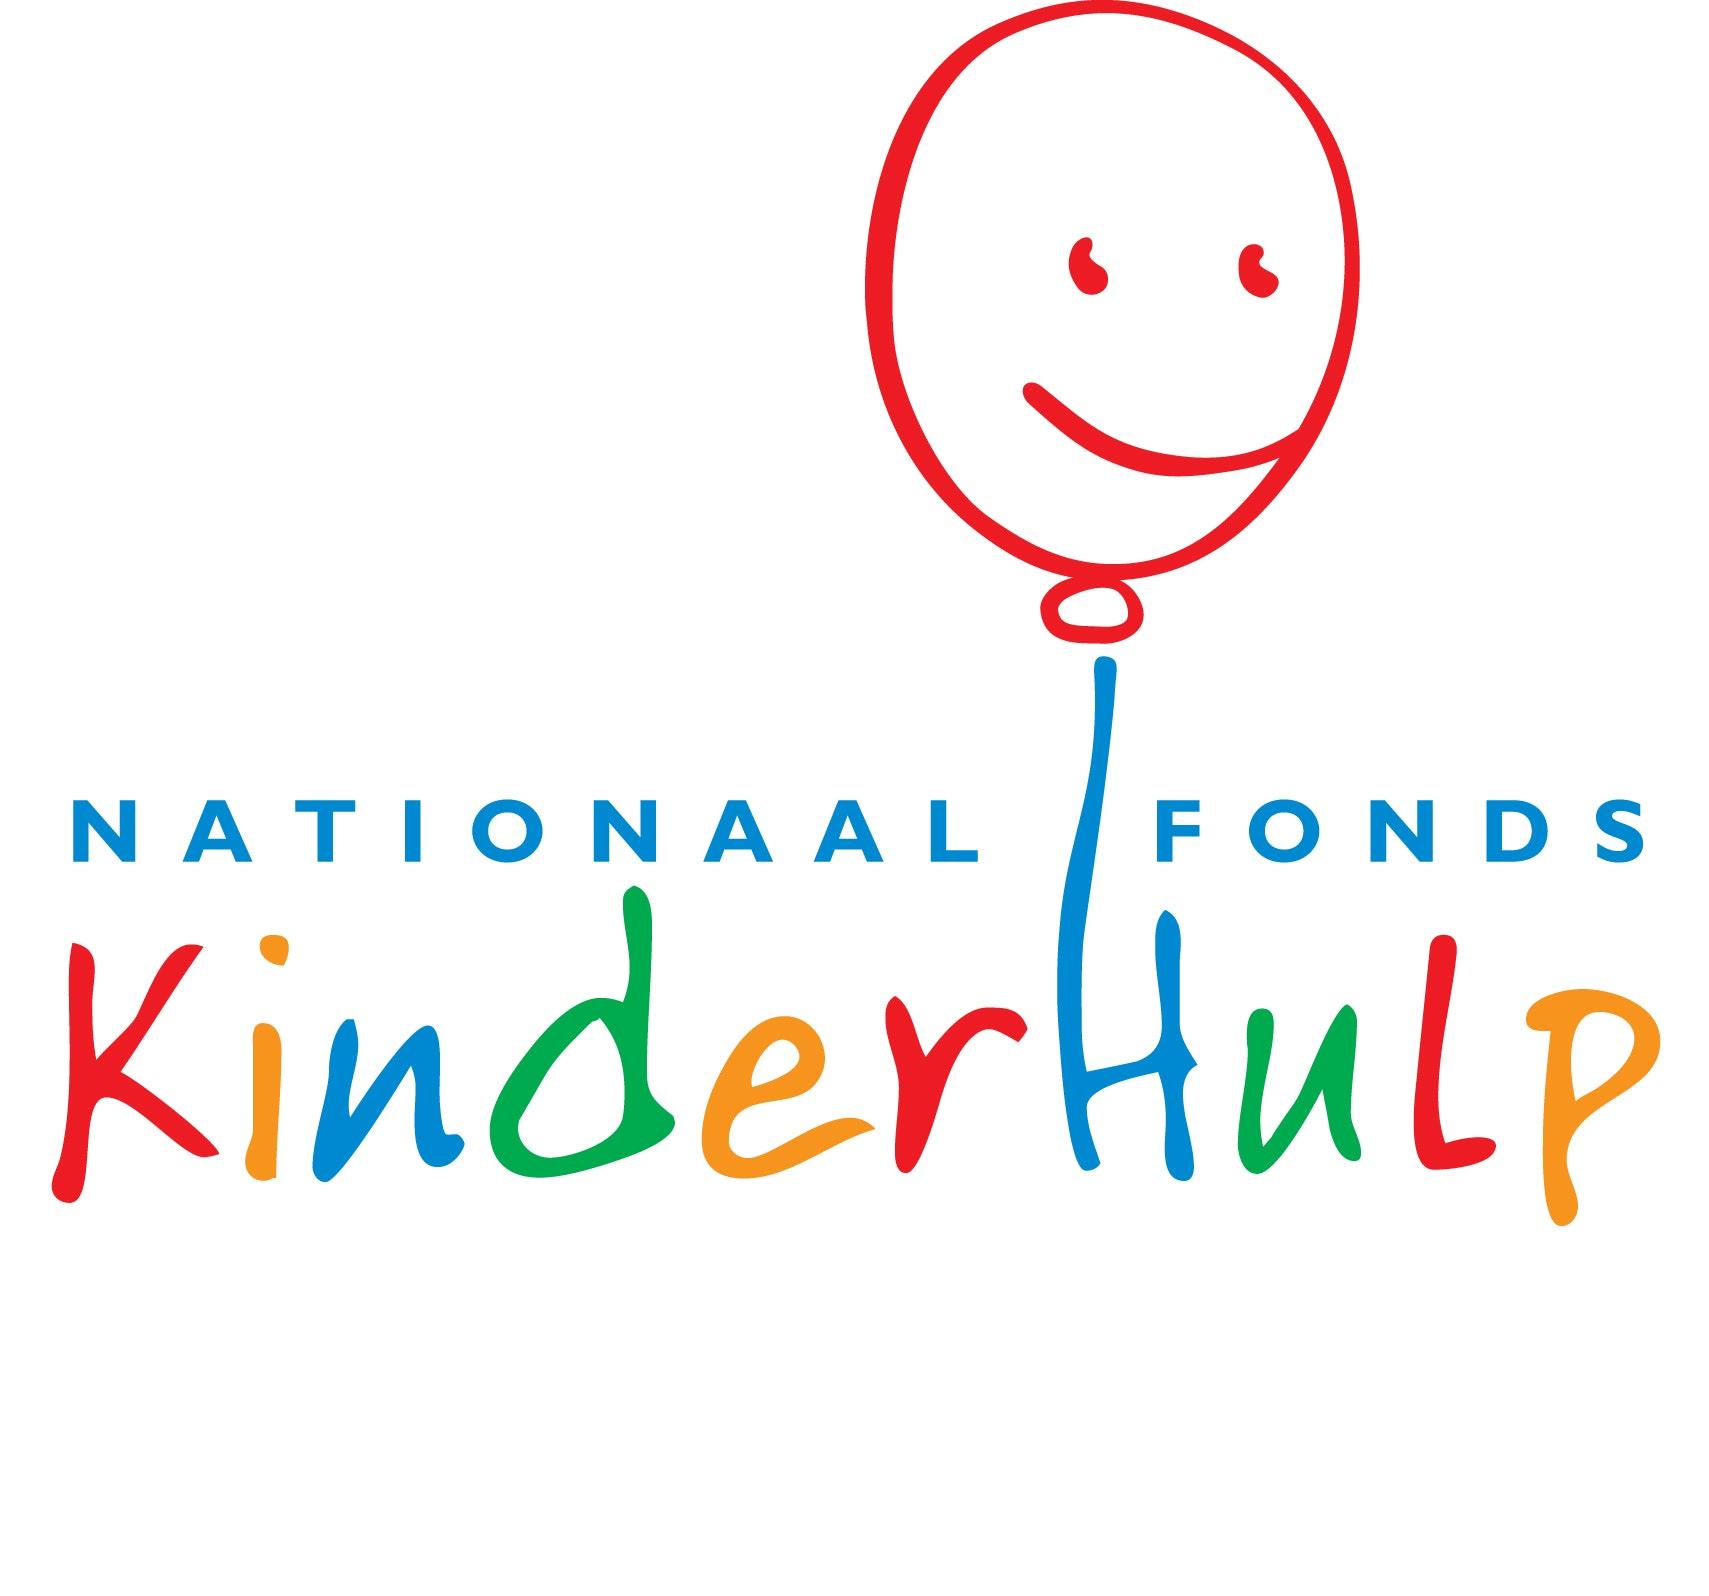 Nationaal Fonds Kinderhulp